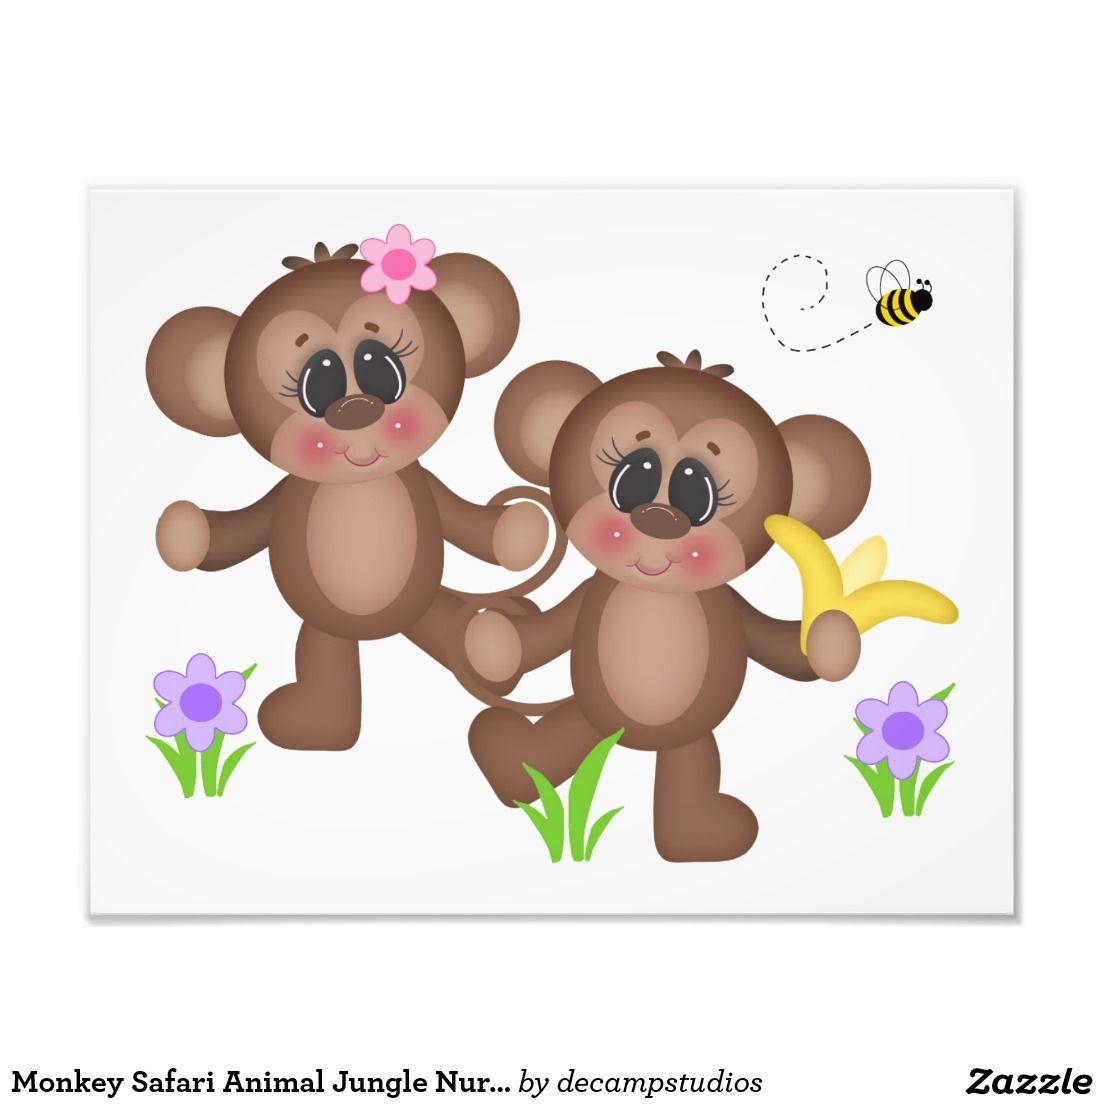 Monkey Safari Animal Jungle Nursery Wall Art Print